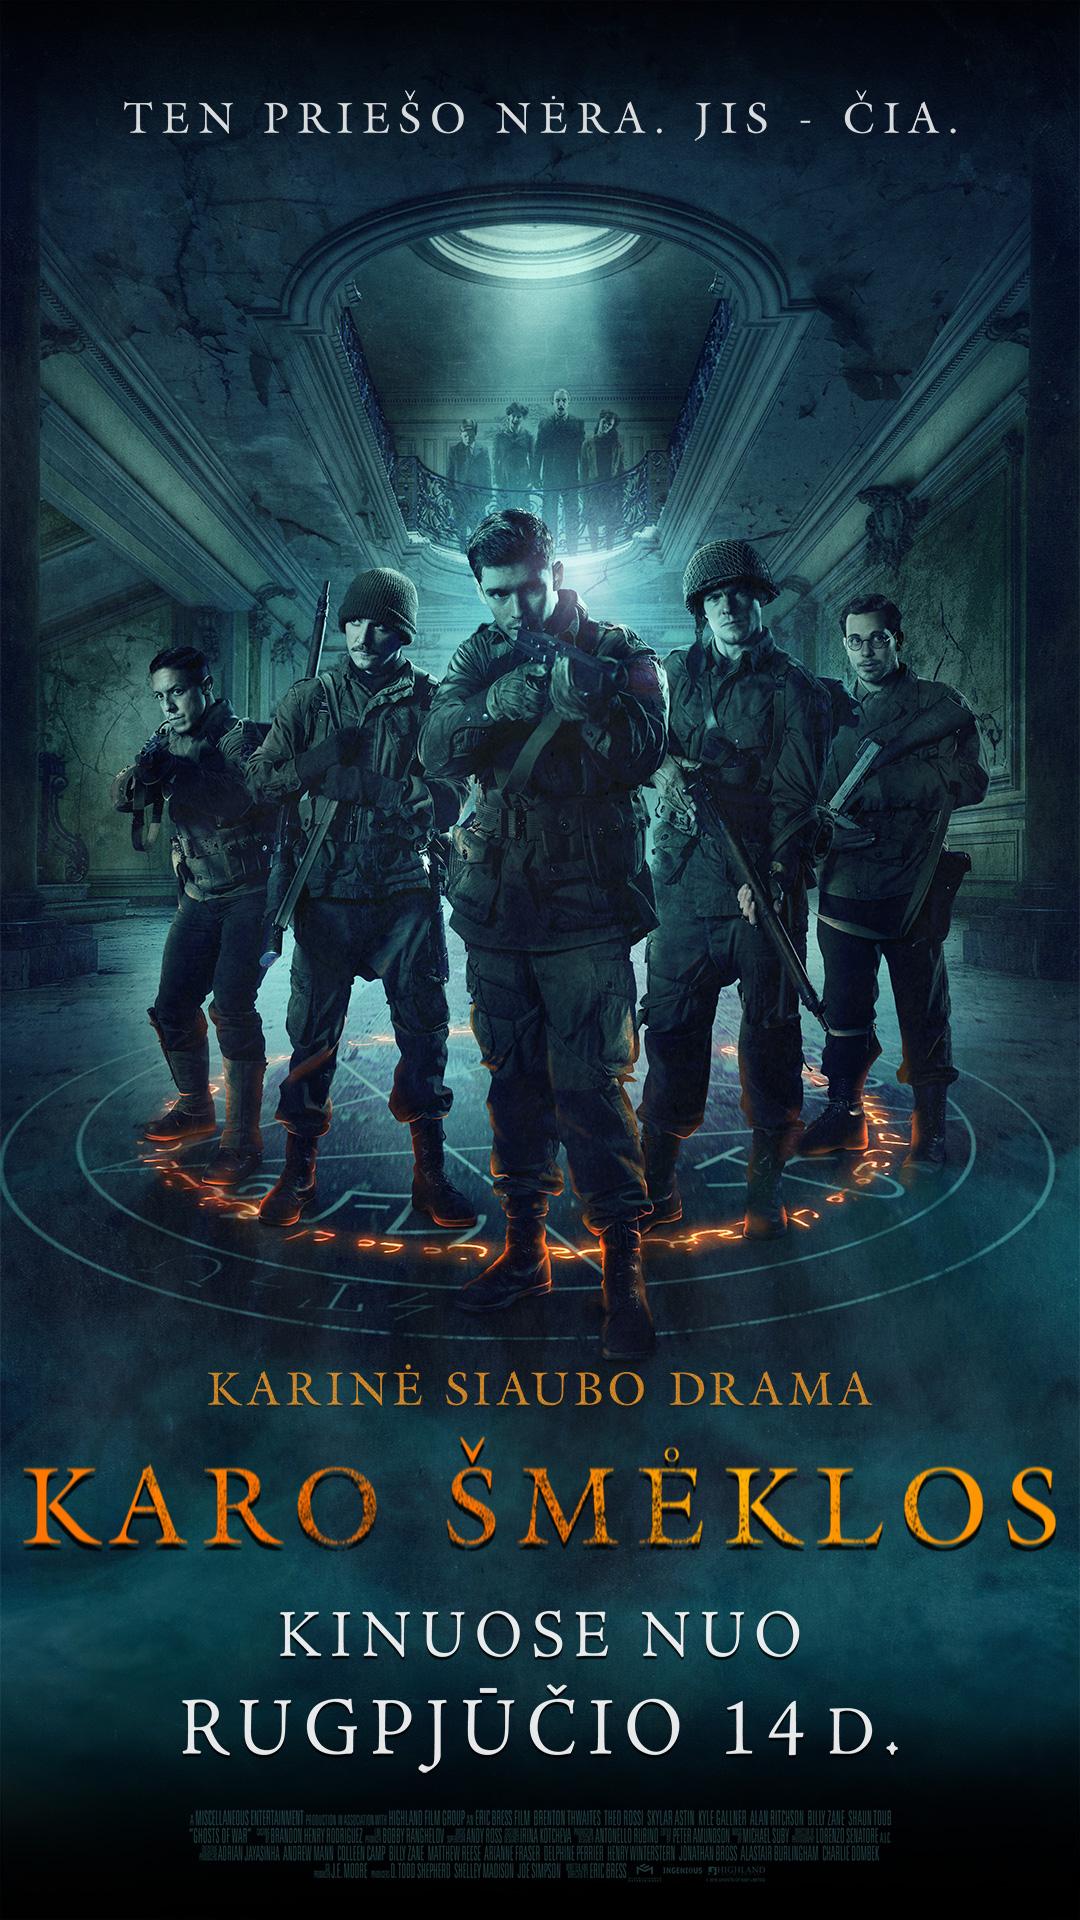 KARO ŠMĖKLOS (Ghosts of War)